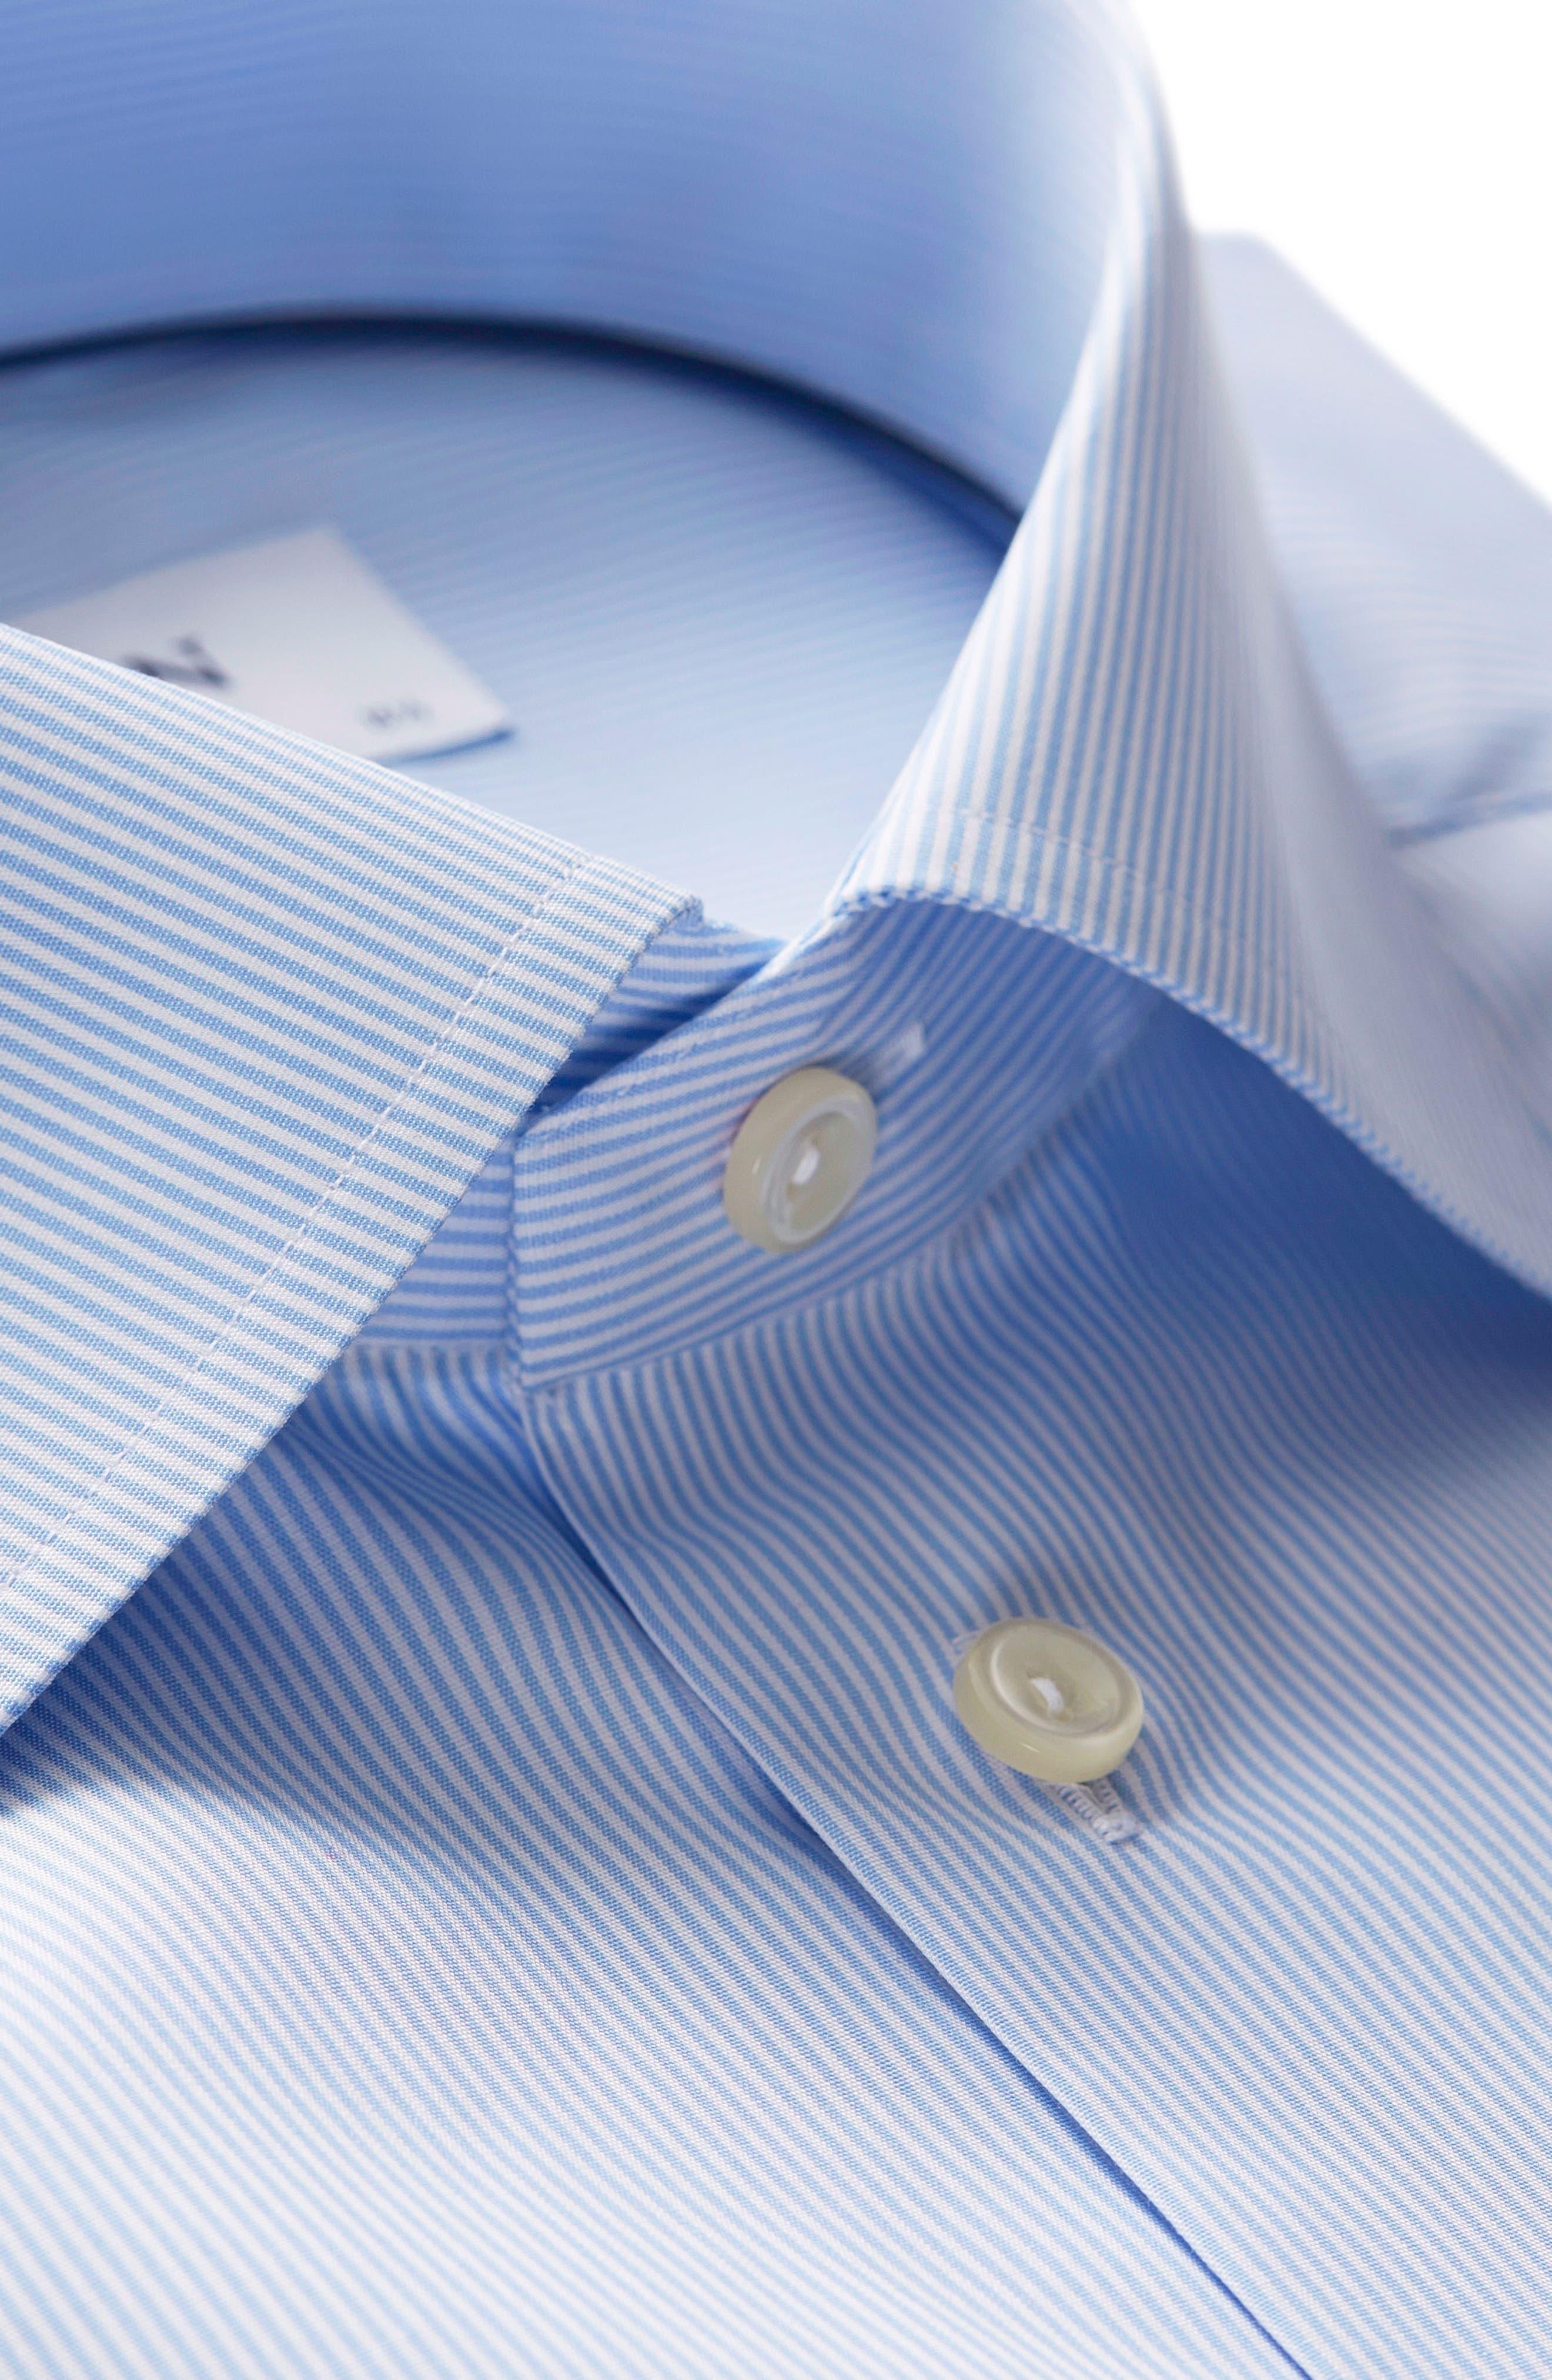 Extra Slim Fit Stripe Dress Shirt,                             Alternate thumbnail 3, color,                             LIGHT BLUE/ WHITE